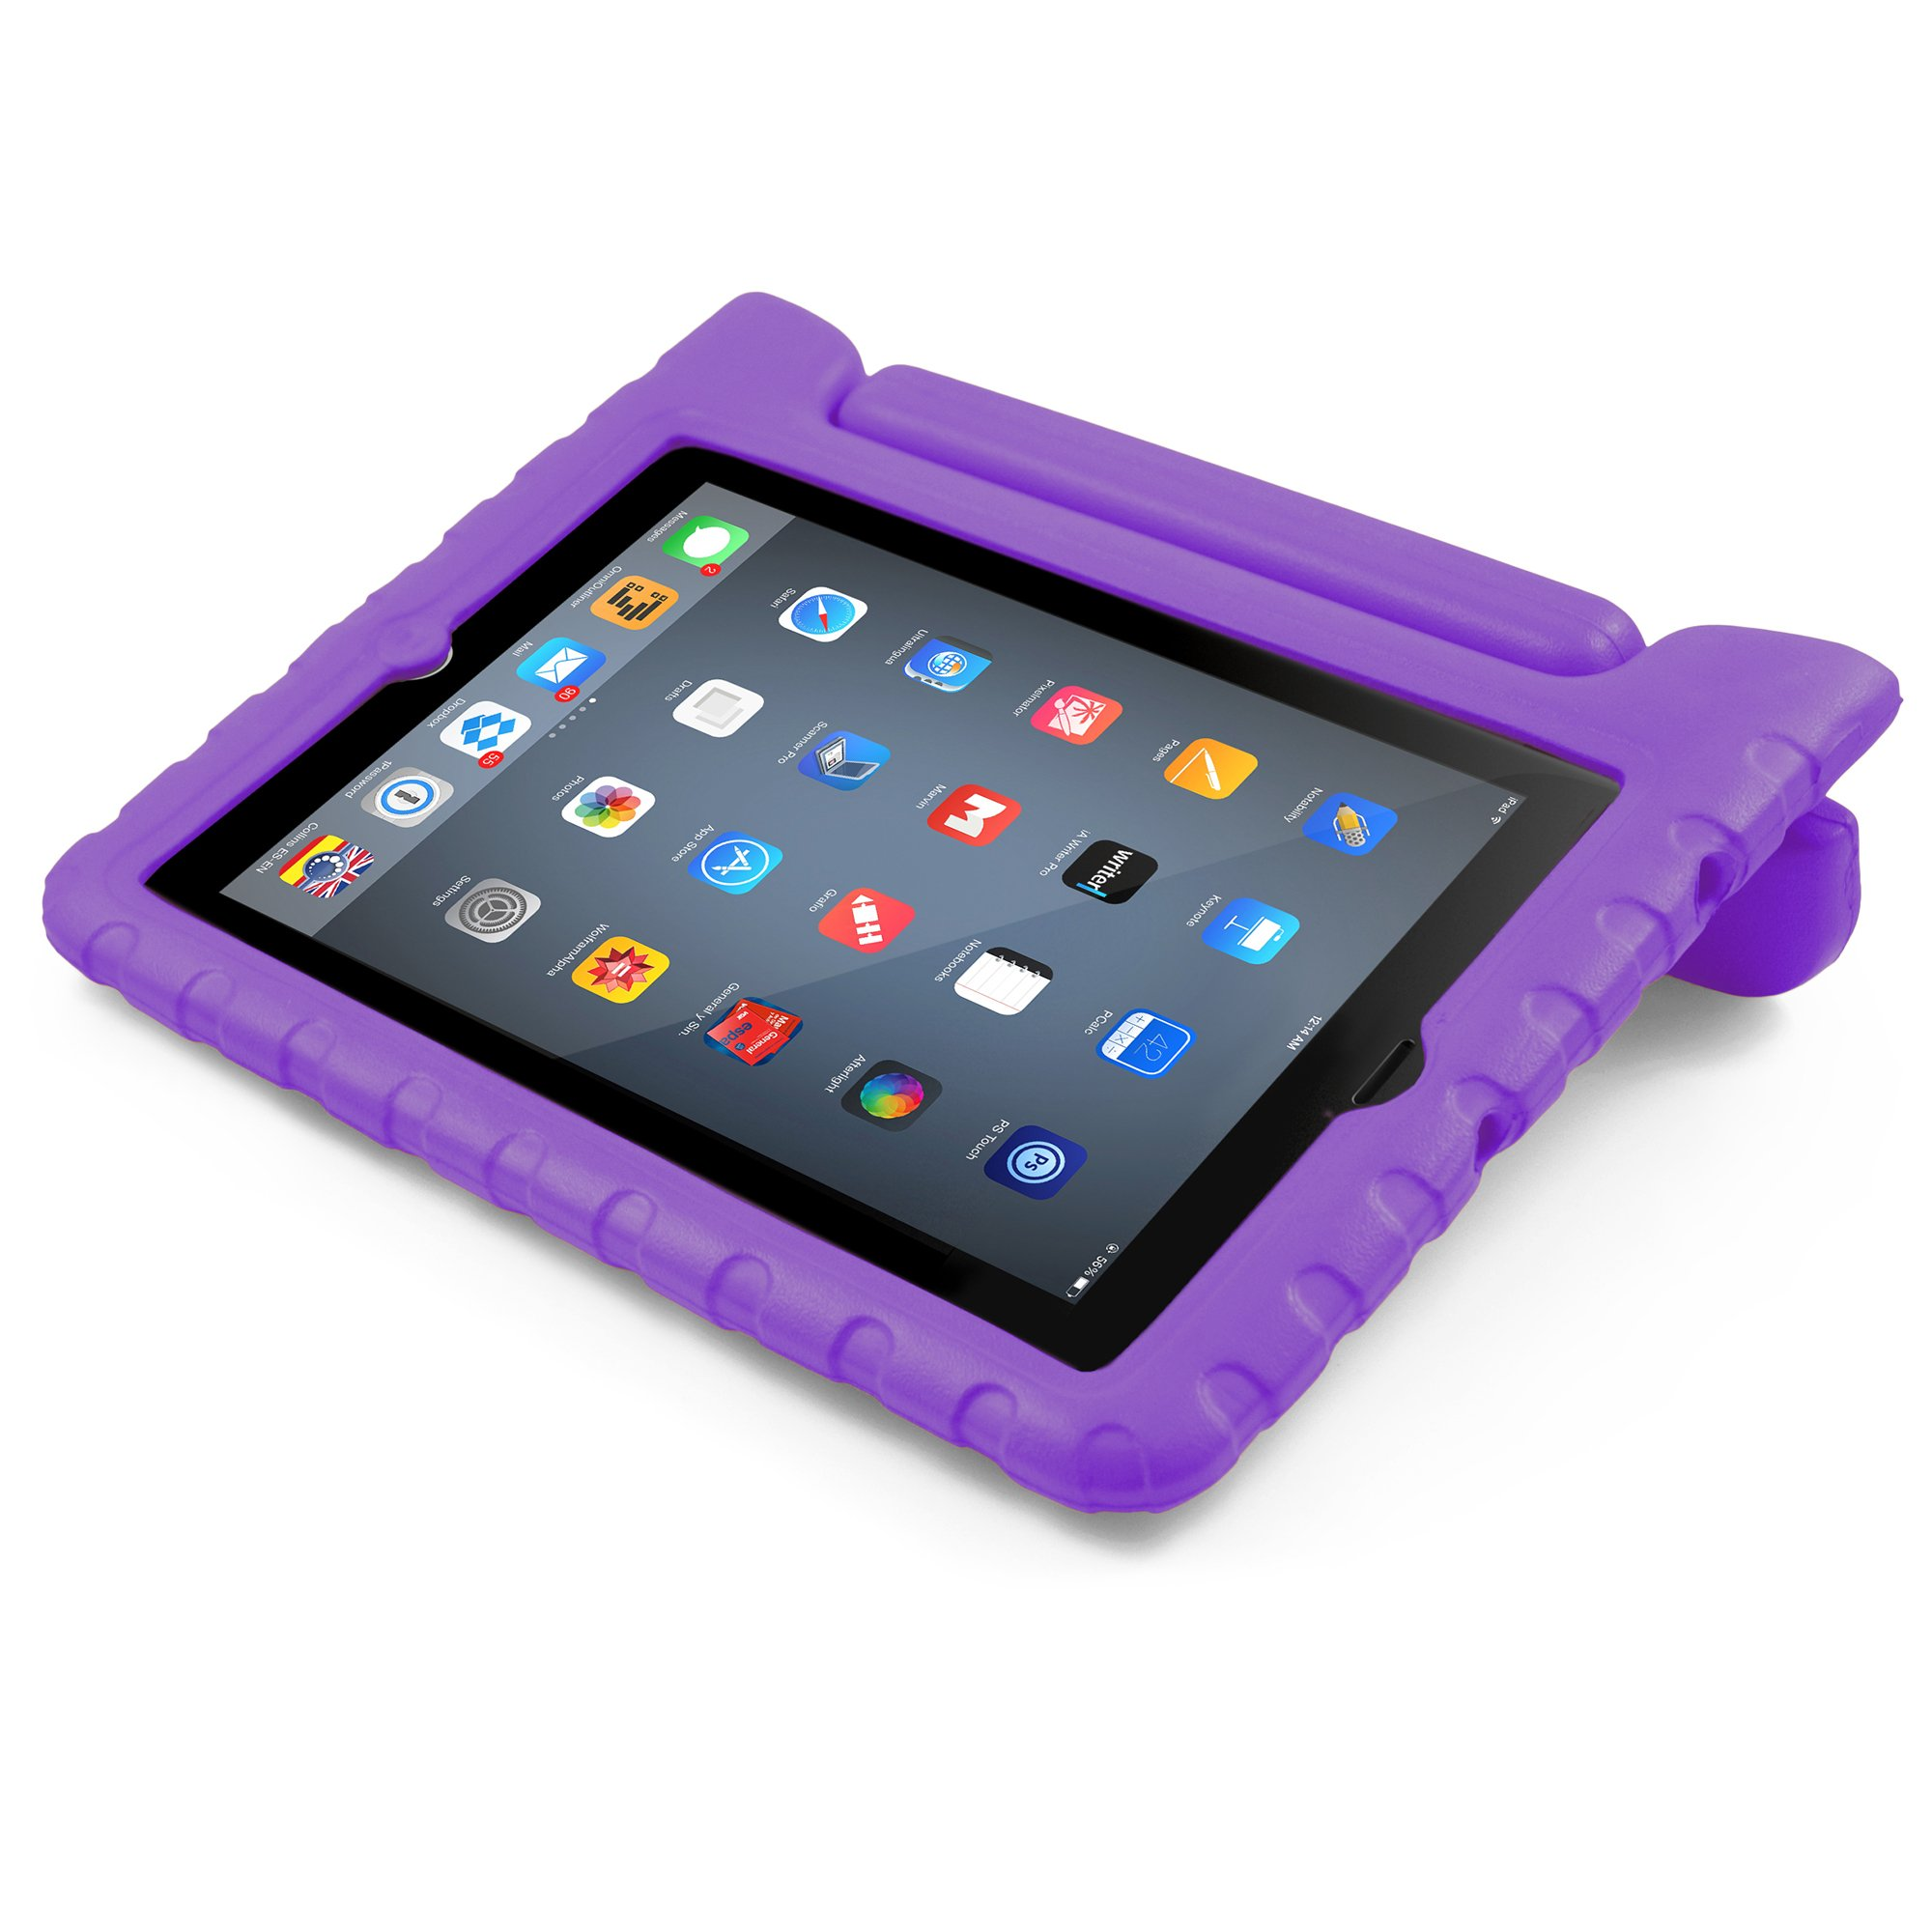 BUDDIBOX iPad Mini Case, [EVA Series] Shock Resistant [Kids Safe][Stand Feature] Carrying Case for Apple Mini iPad 1/2 / 3/4 and Retina, (Purple)